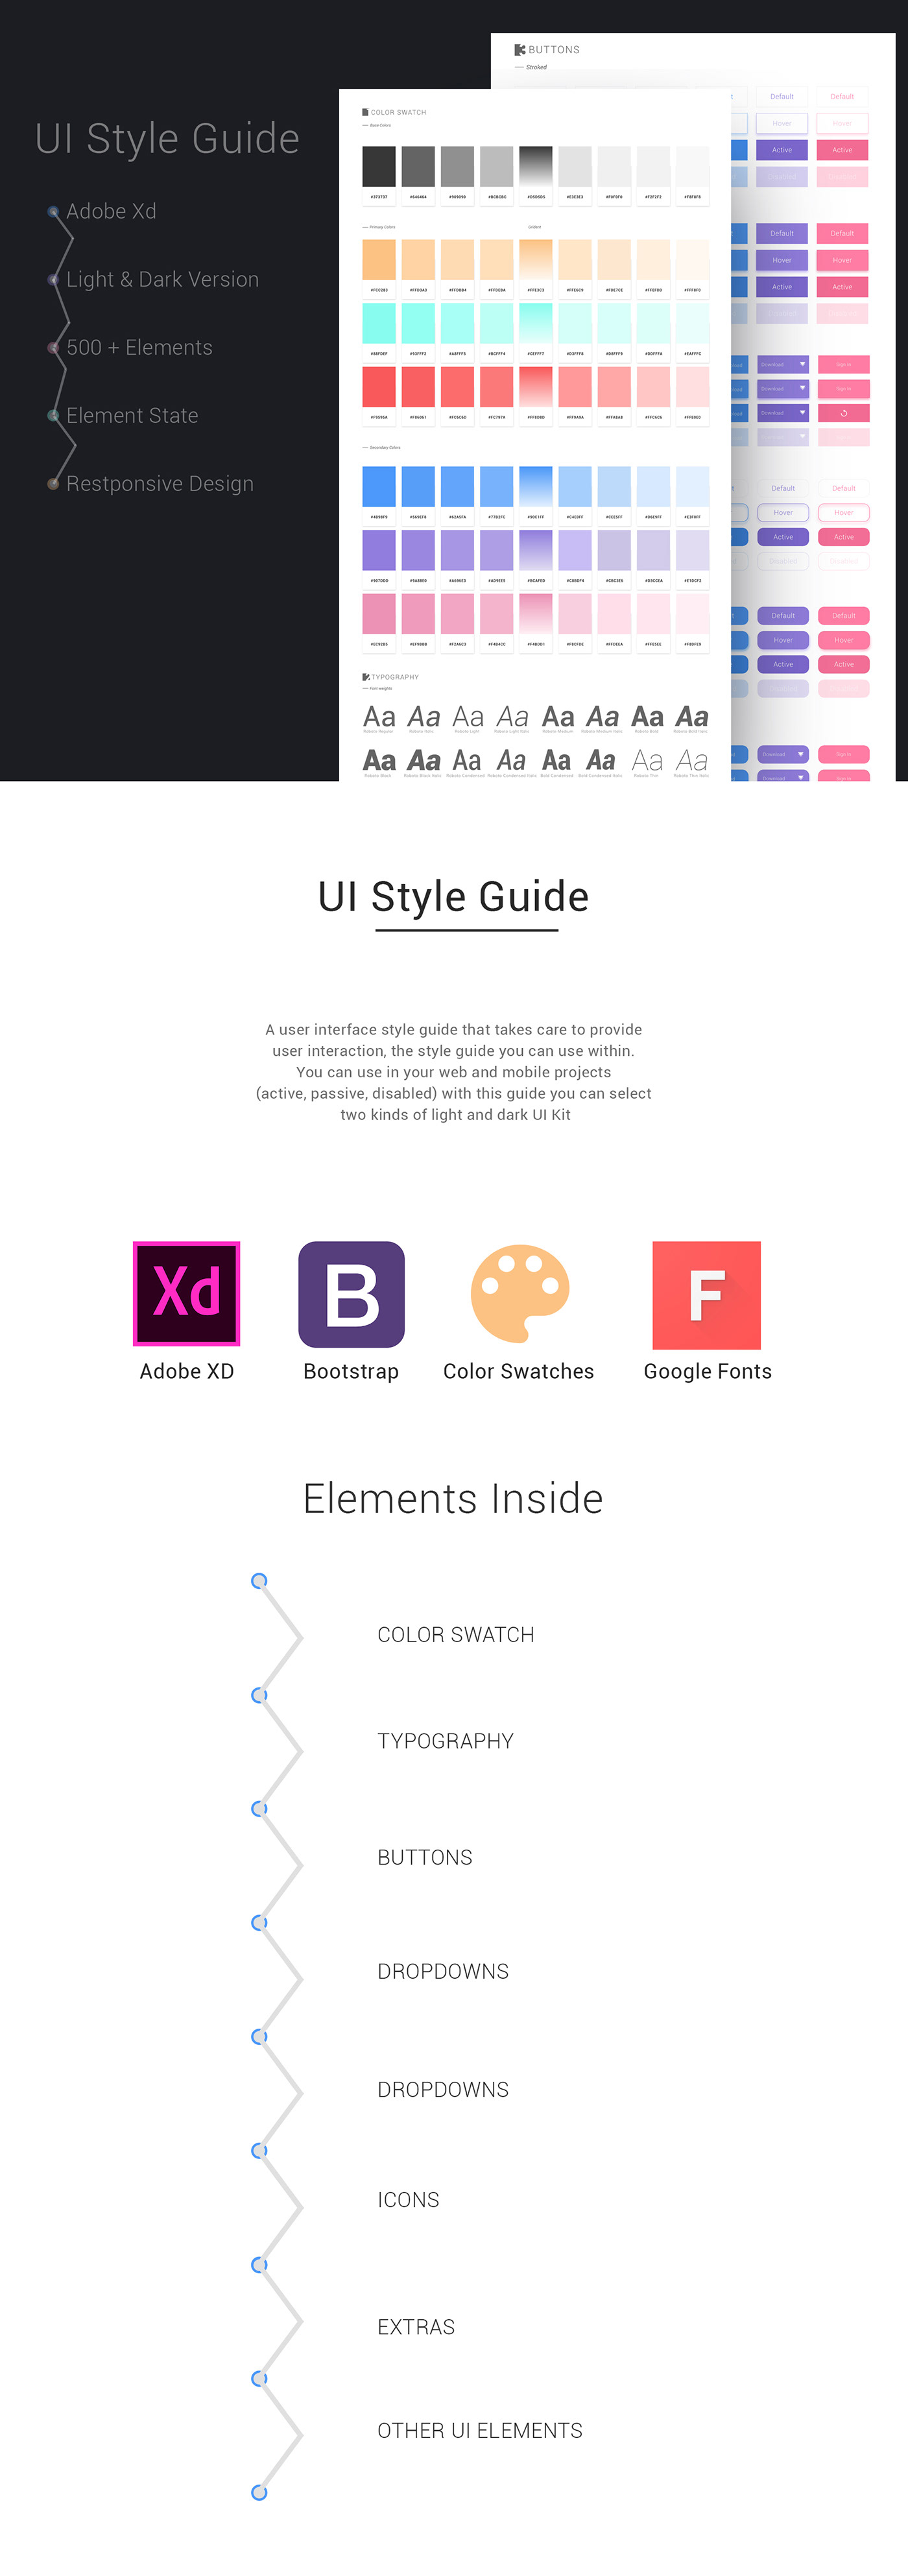 UI ux Web ui style ui light version ui dark version freebie resources muharrem yağan downloads